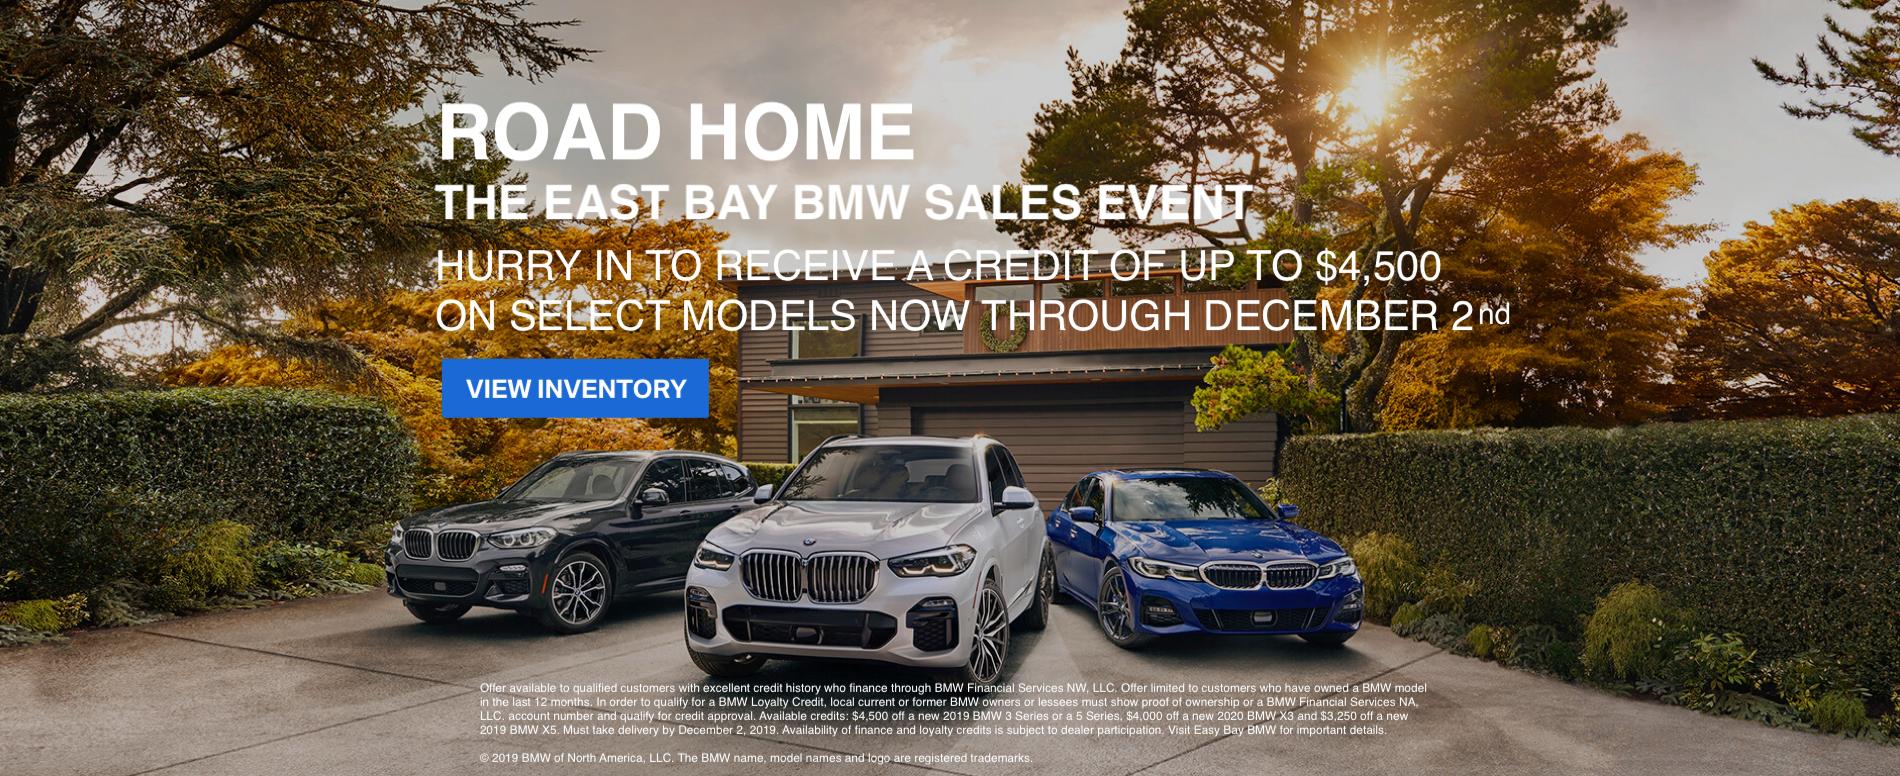 east bay bmw road home sales event november 2019